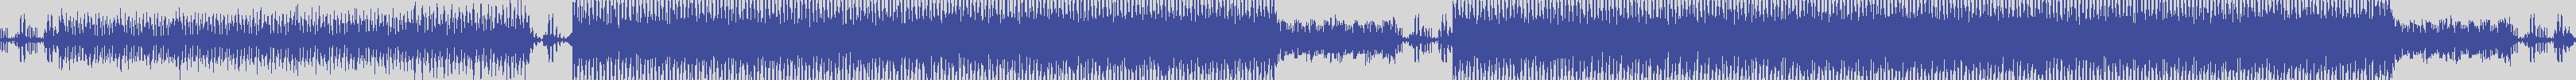 just_digital_records [JS1361] Kosmica - Rytmo Tribal [Original Mix] audio wave form